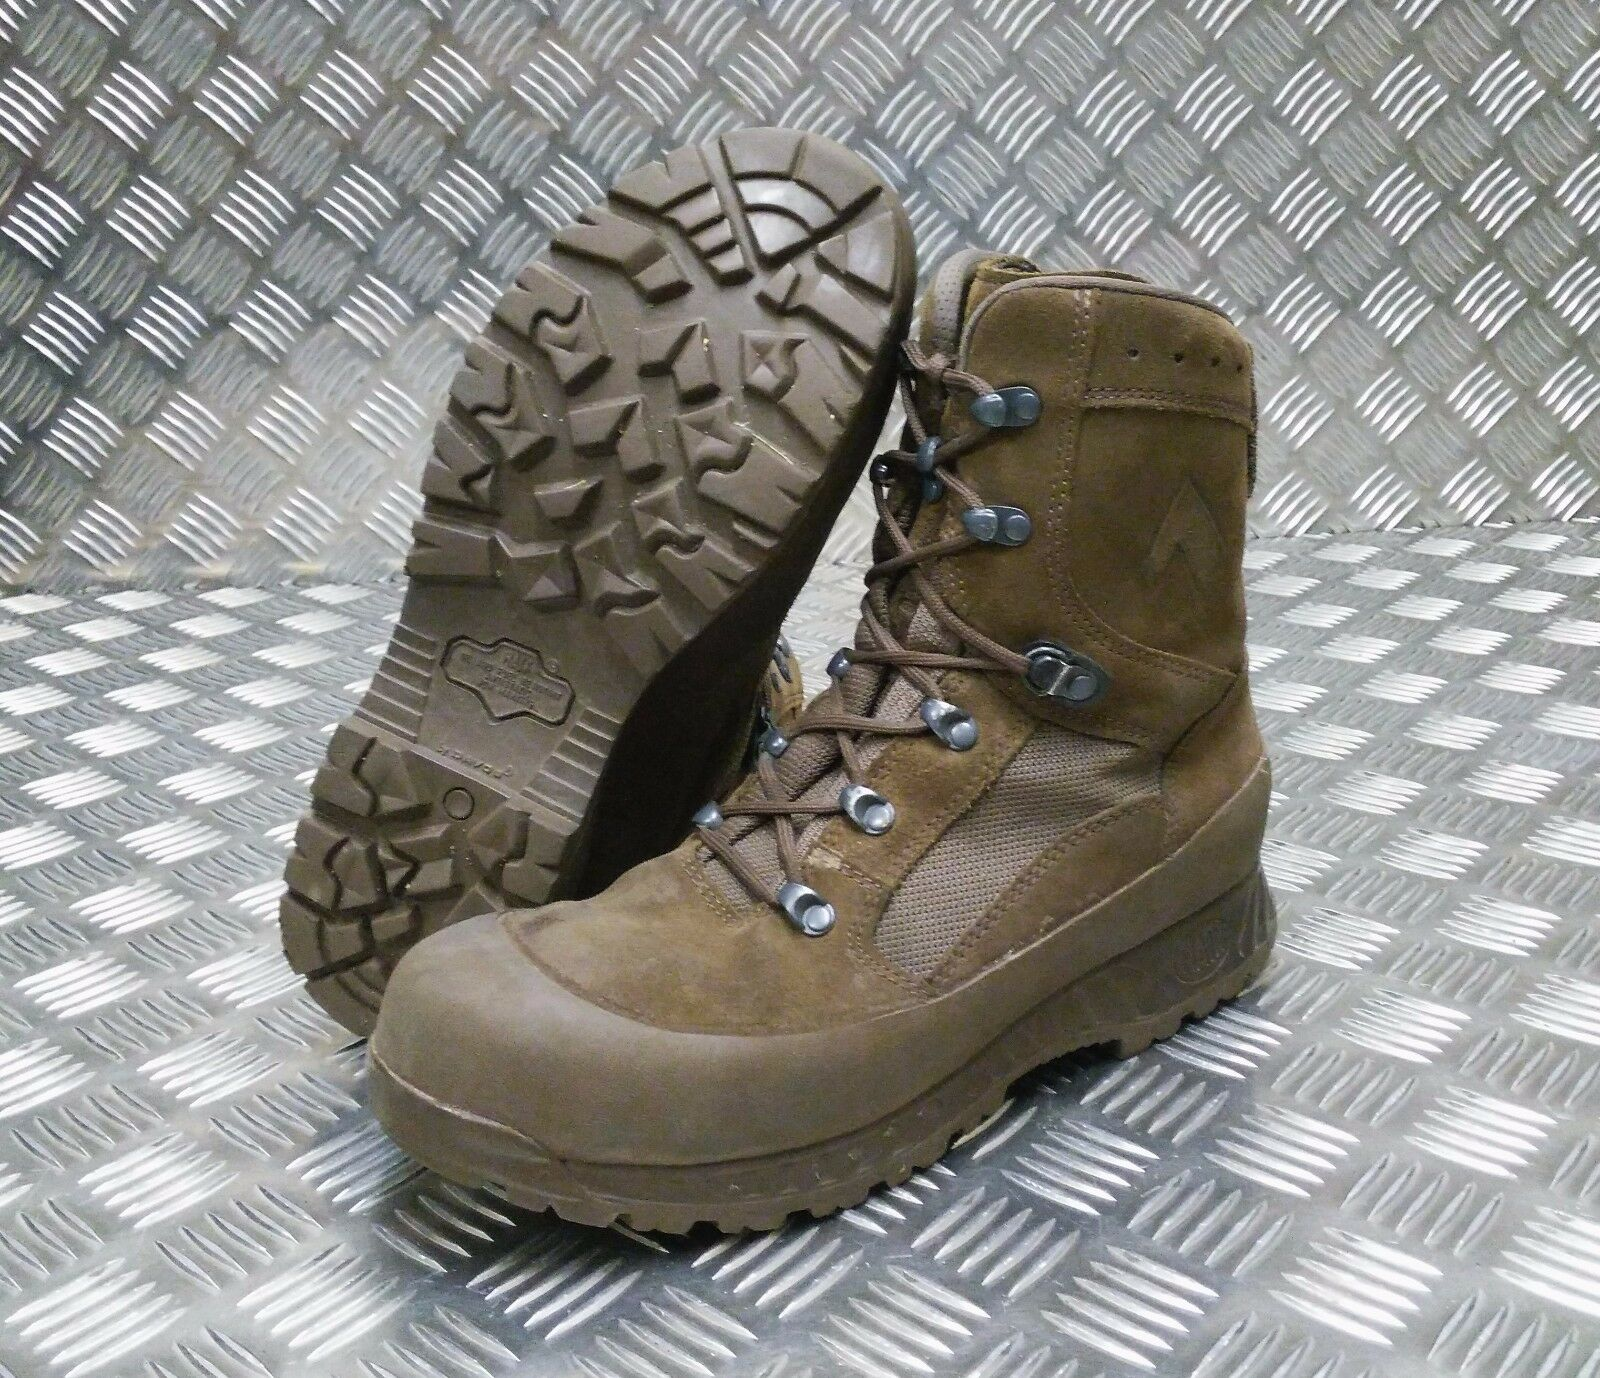 Genuine British Army Haix / Desert Suede Leather Assault / Haix Patrol Combat botas f50795